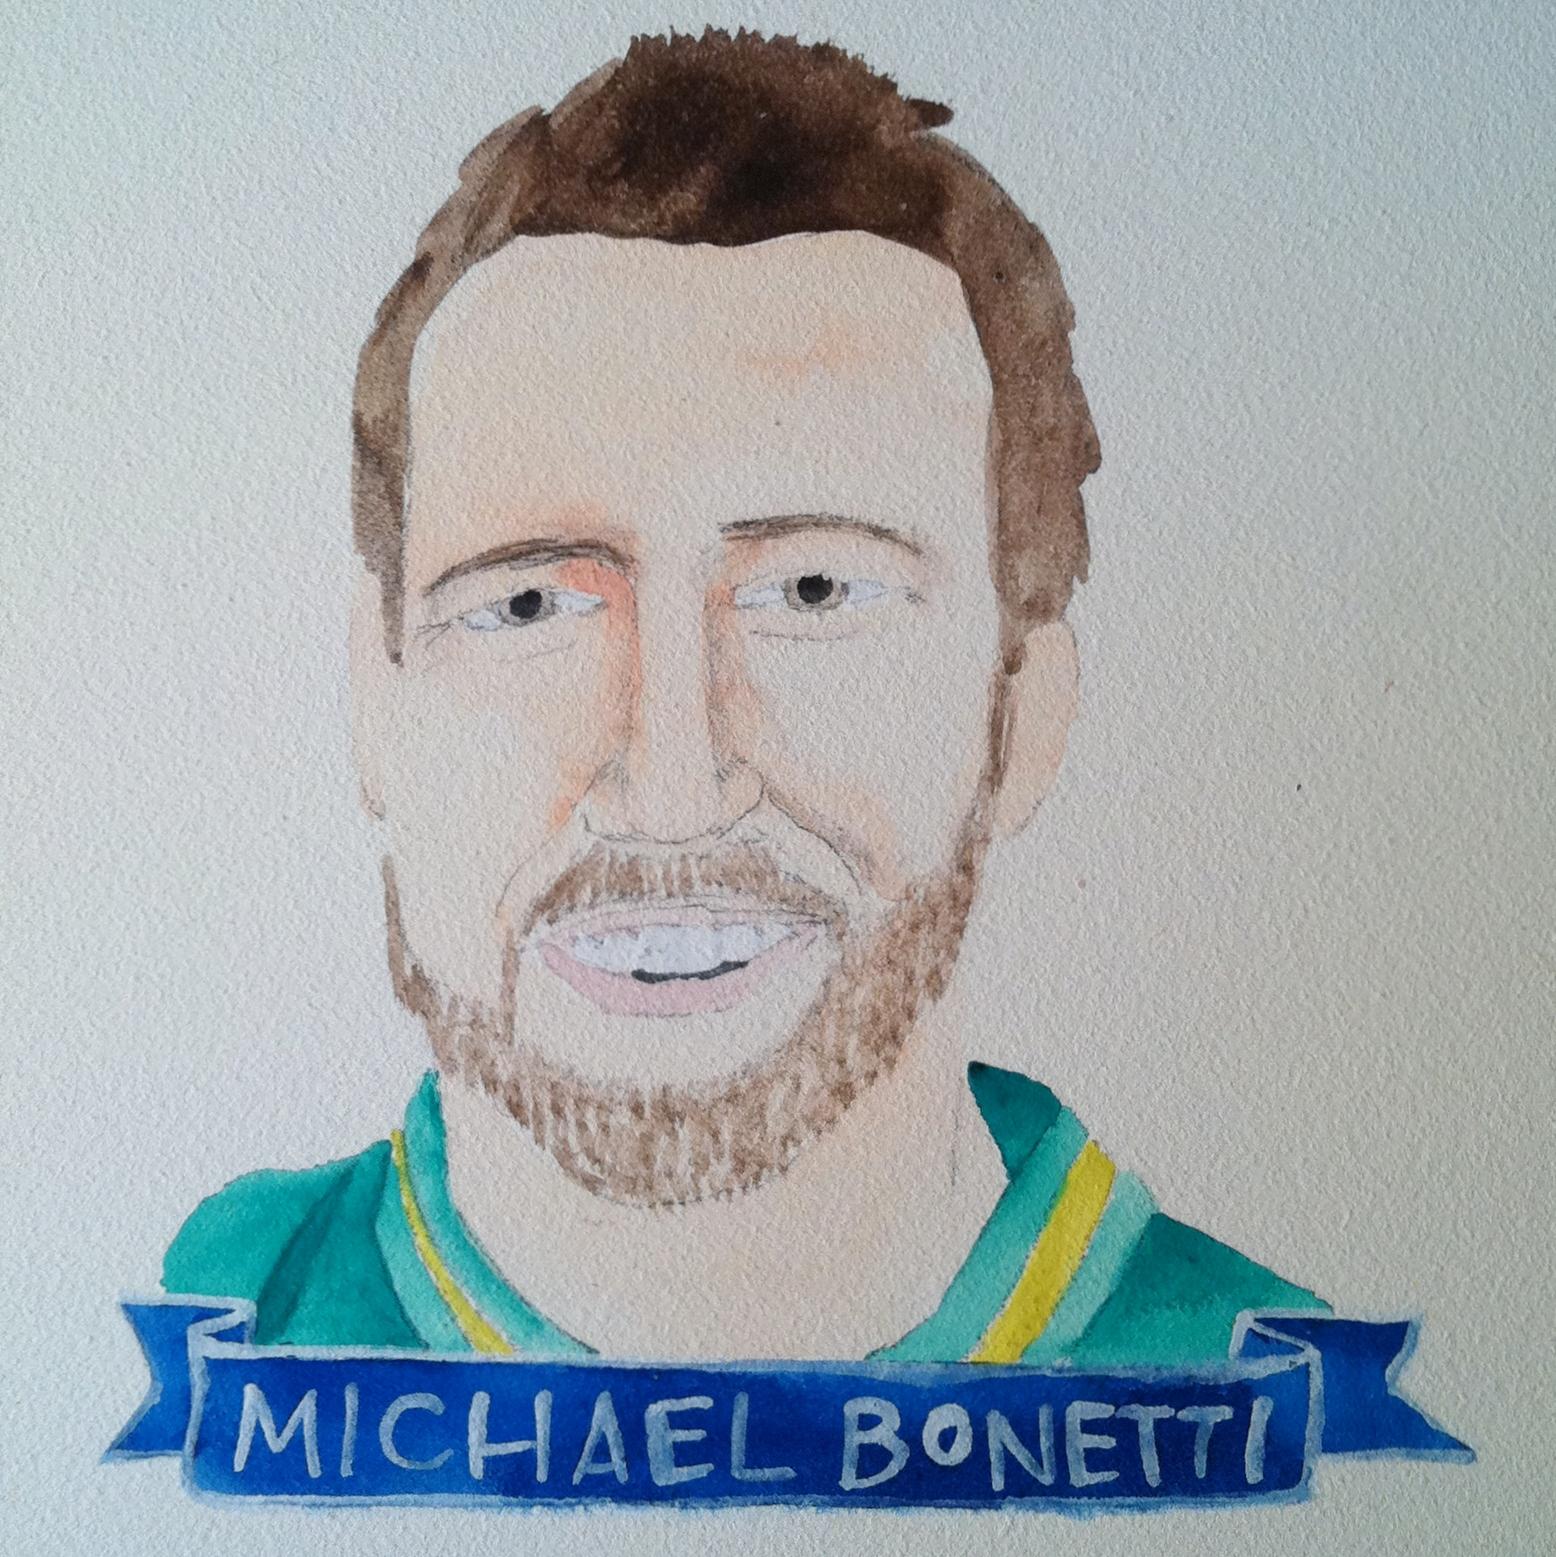 Talent Loves Company at Barbara Archer Gallery: 365 portraits by Lydia Walls - Michael Bonetti